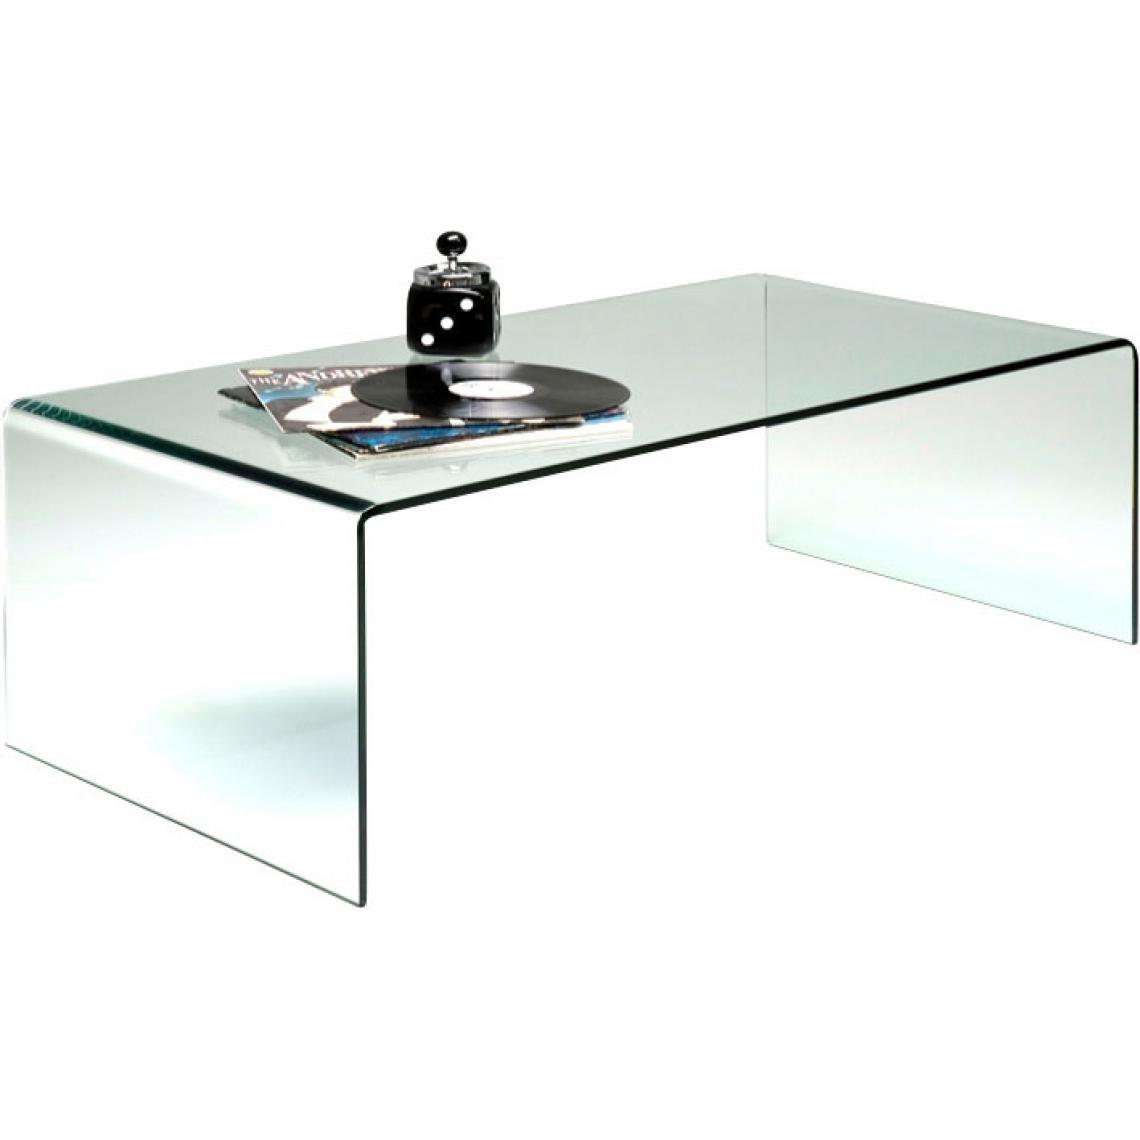 KARE DESIGN Table basse en verre Bahia 120 cm